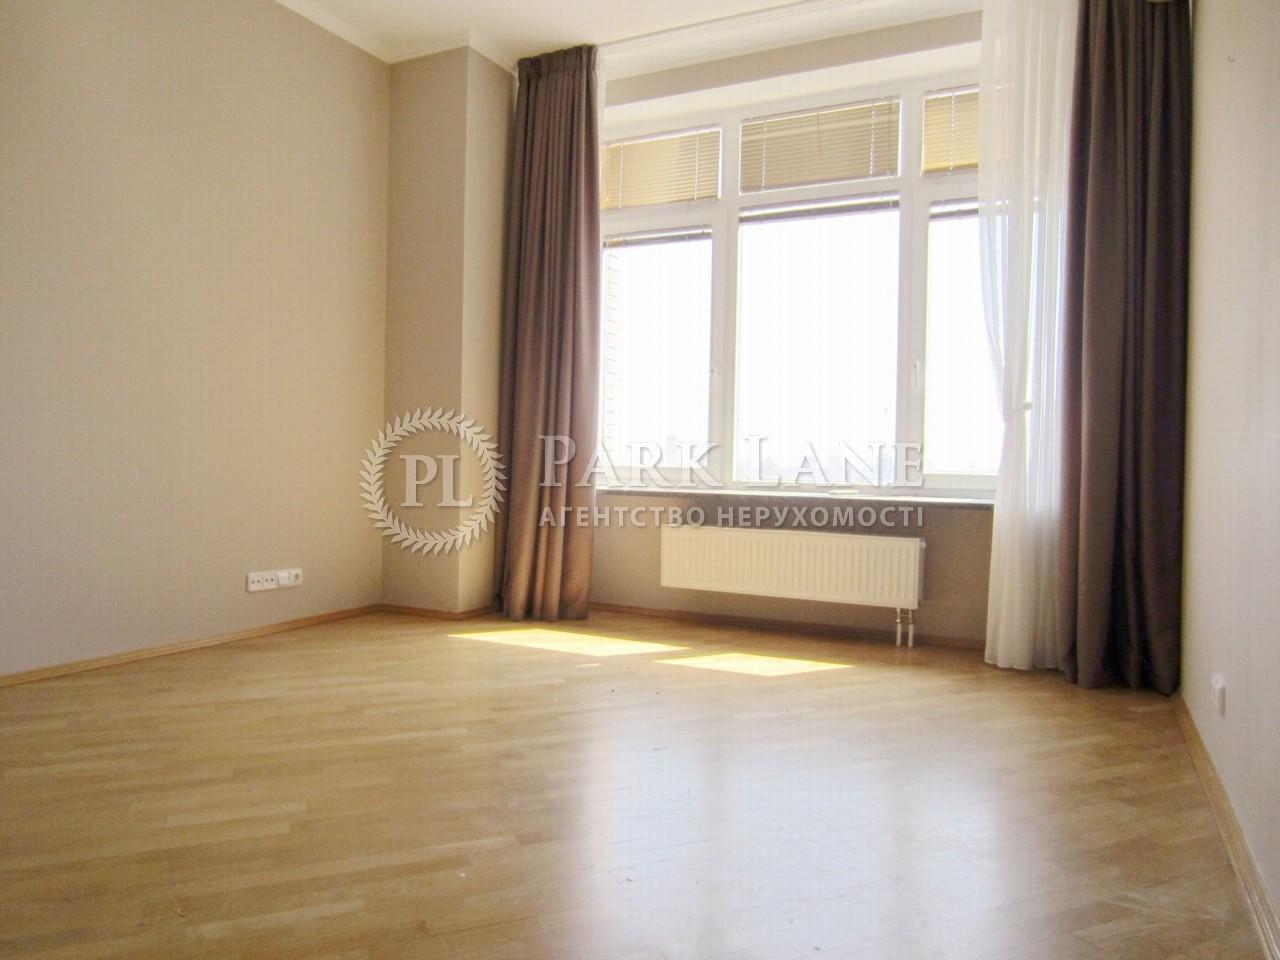 Квартира ул. Бульварно-Кудрявская (Воровского) , 11а, Киев, Z-864705 - Фото 5